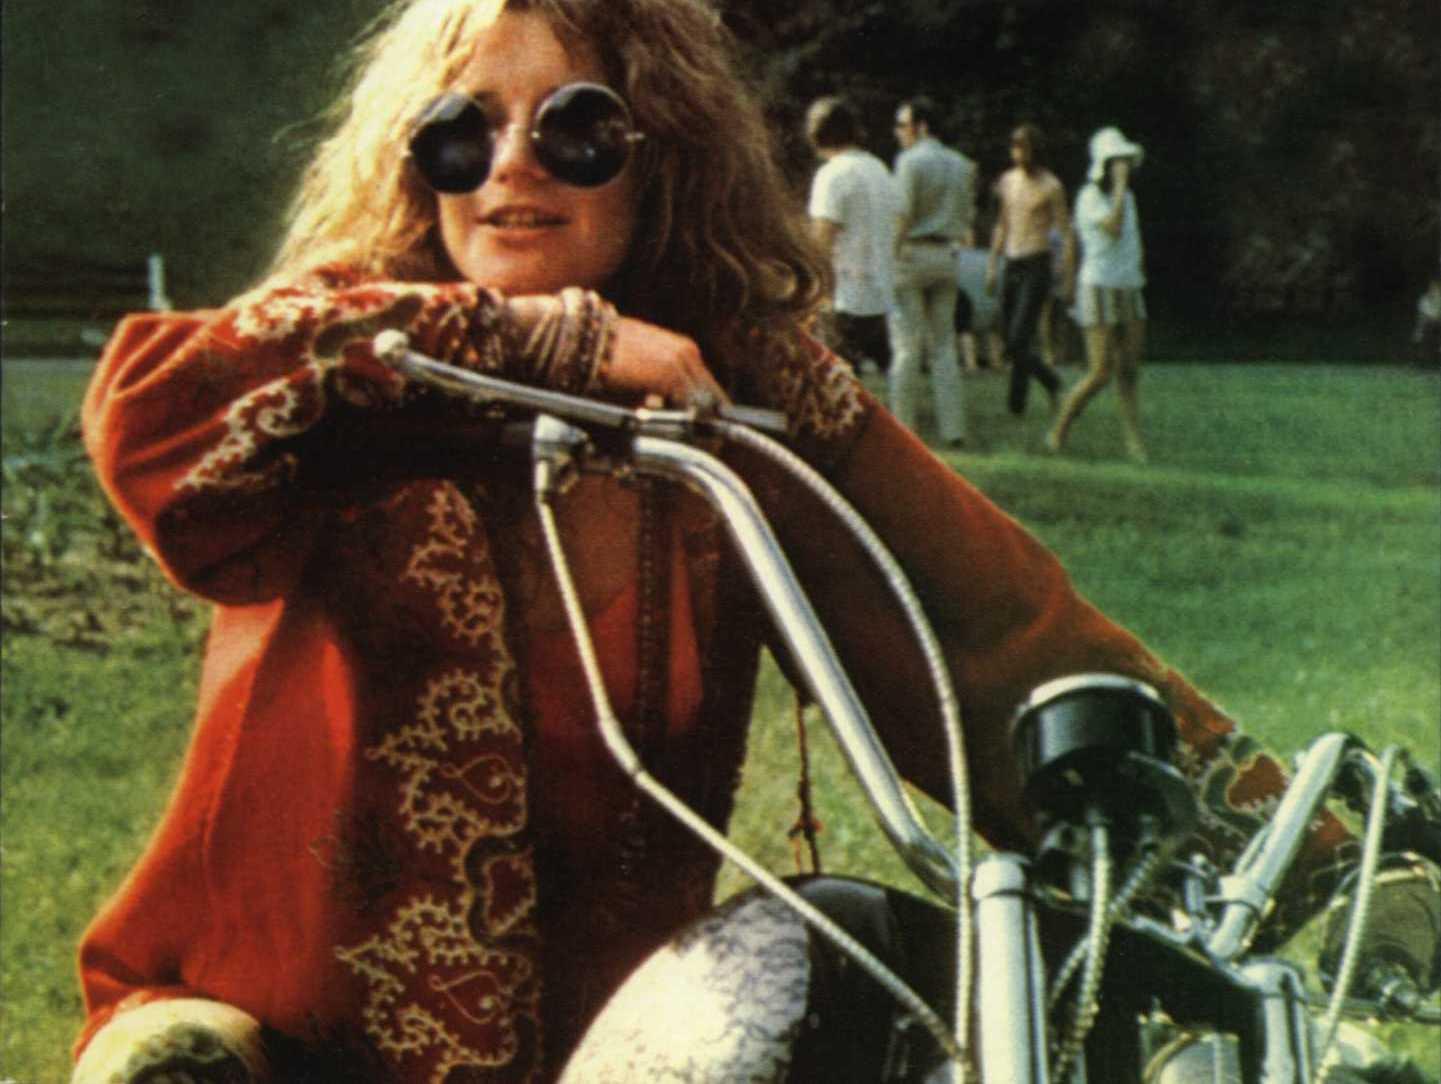 Shock claim Rocker Jim Morrison found ALIVE living as